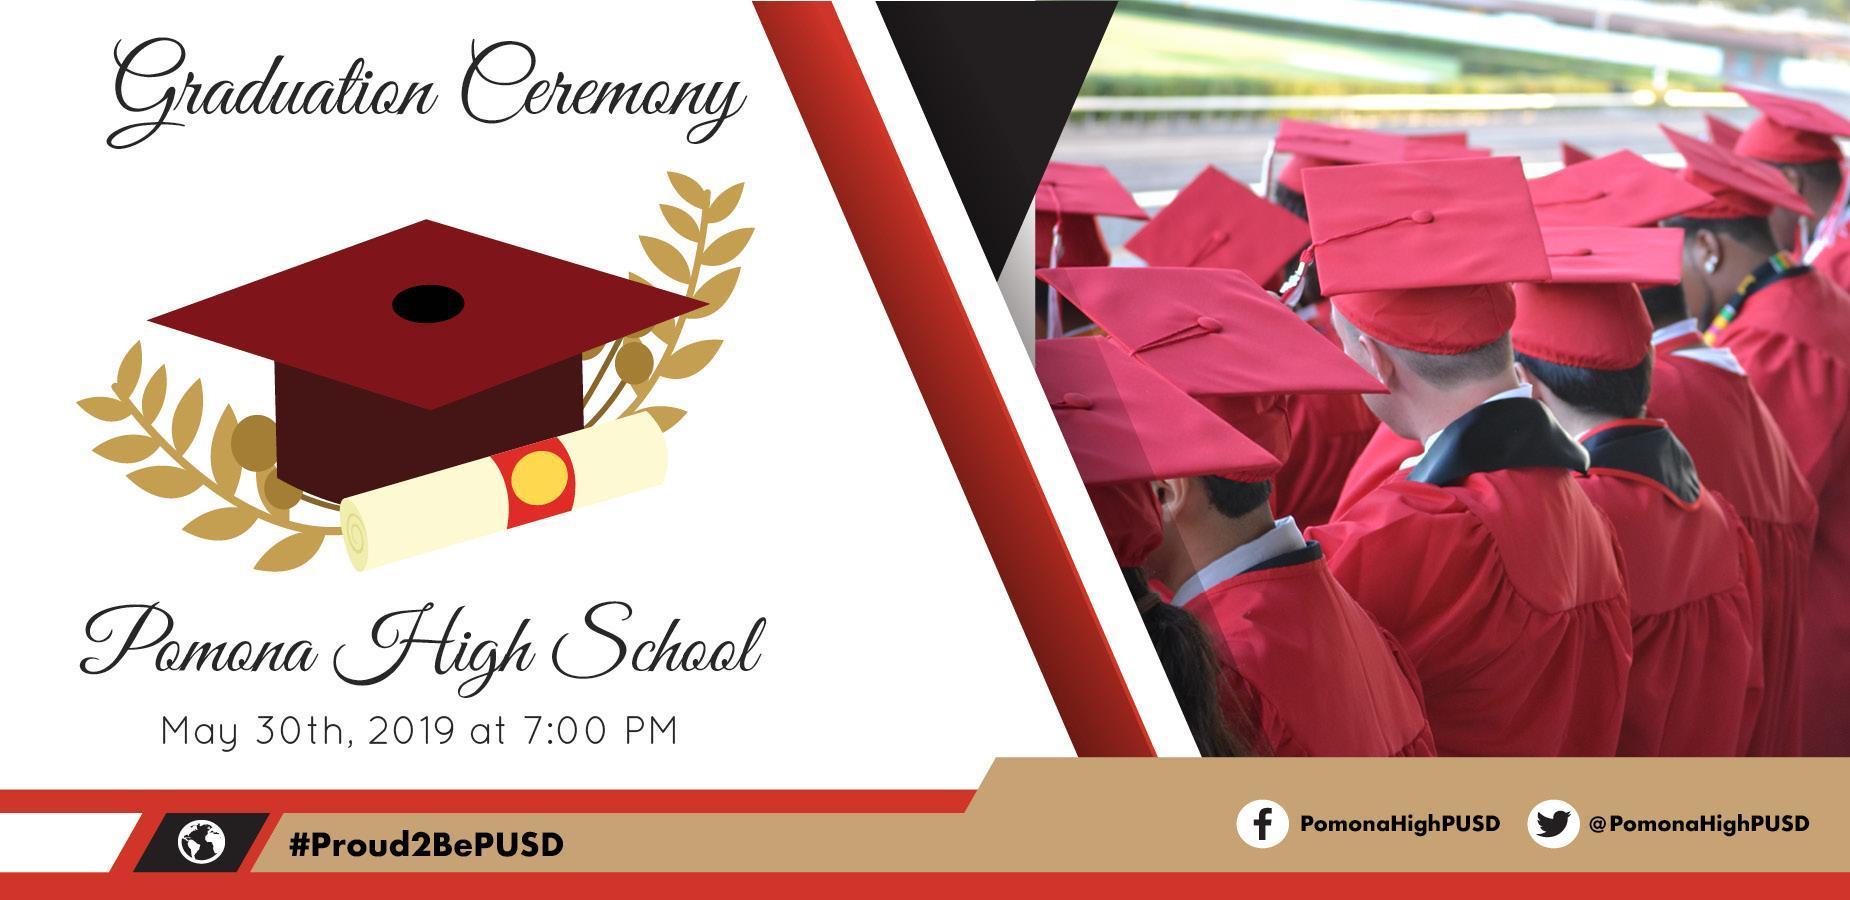 Pomona High School: May 30th, 2019 at 7:00 pm